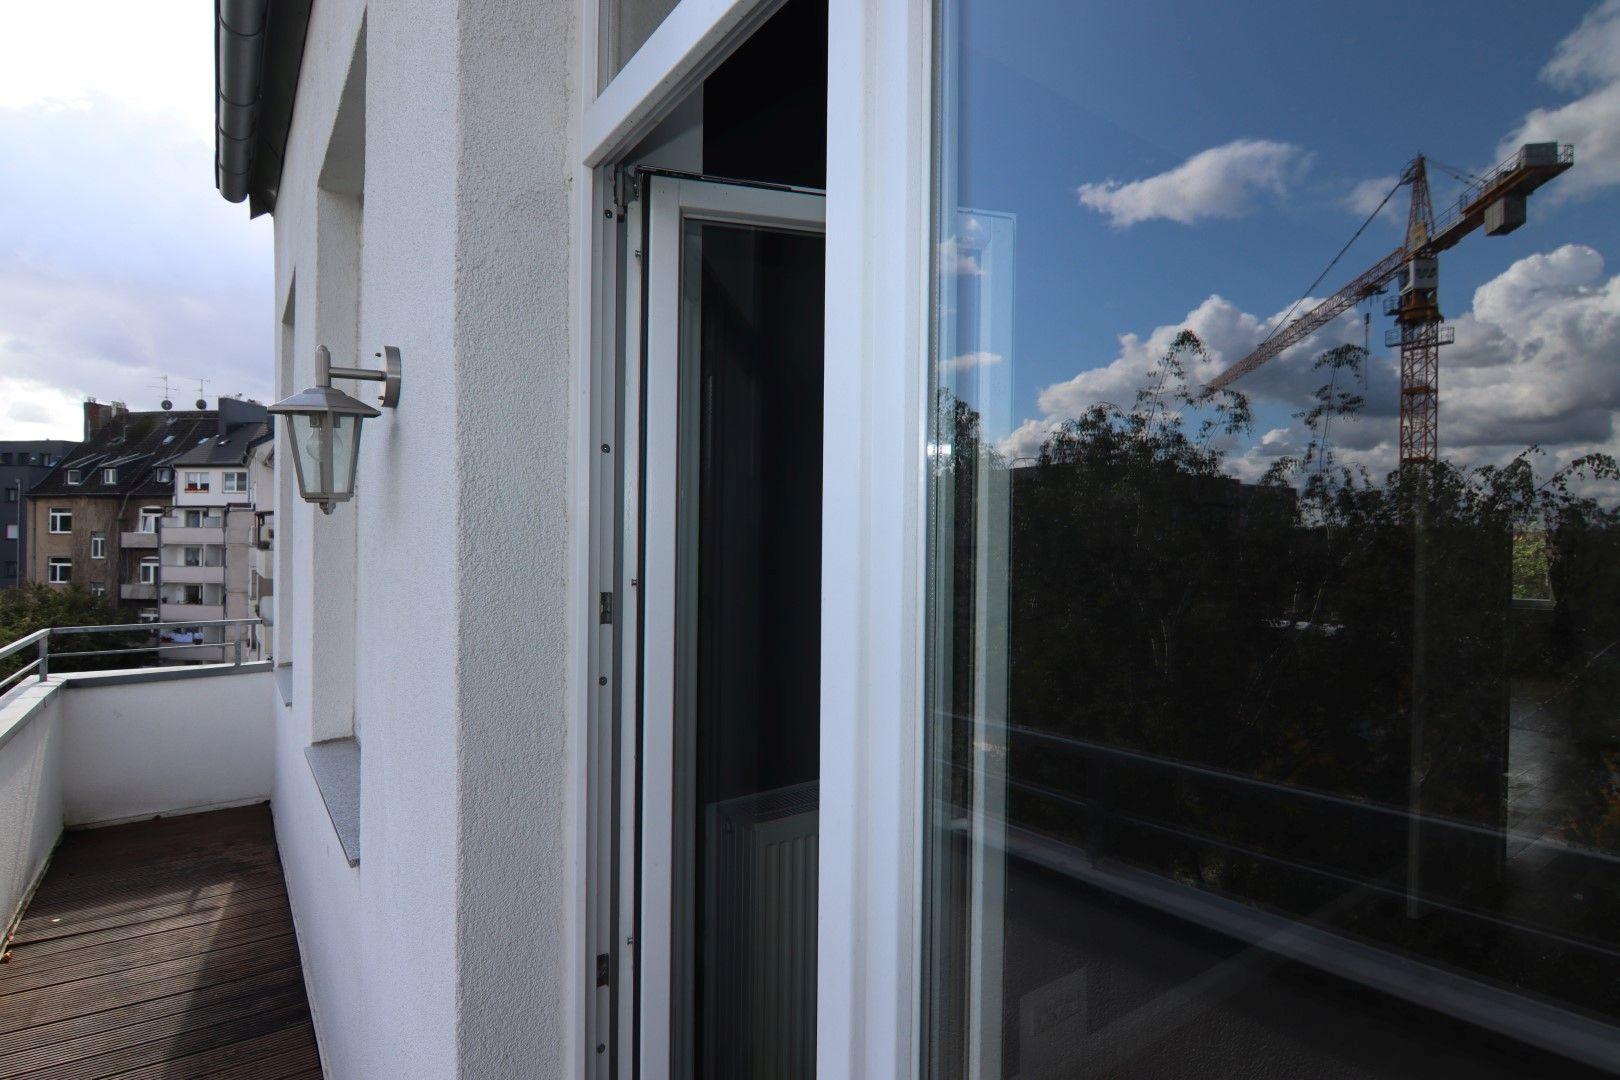 Immobilie Nr.0271 - 3-Zimmer-Altbauwohnung mit Aufzug im 3.OG - Bild 10.jpg